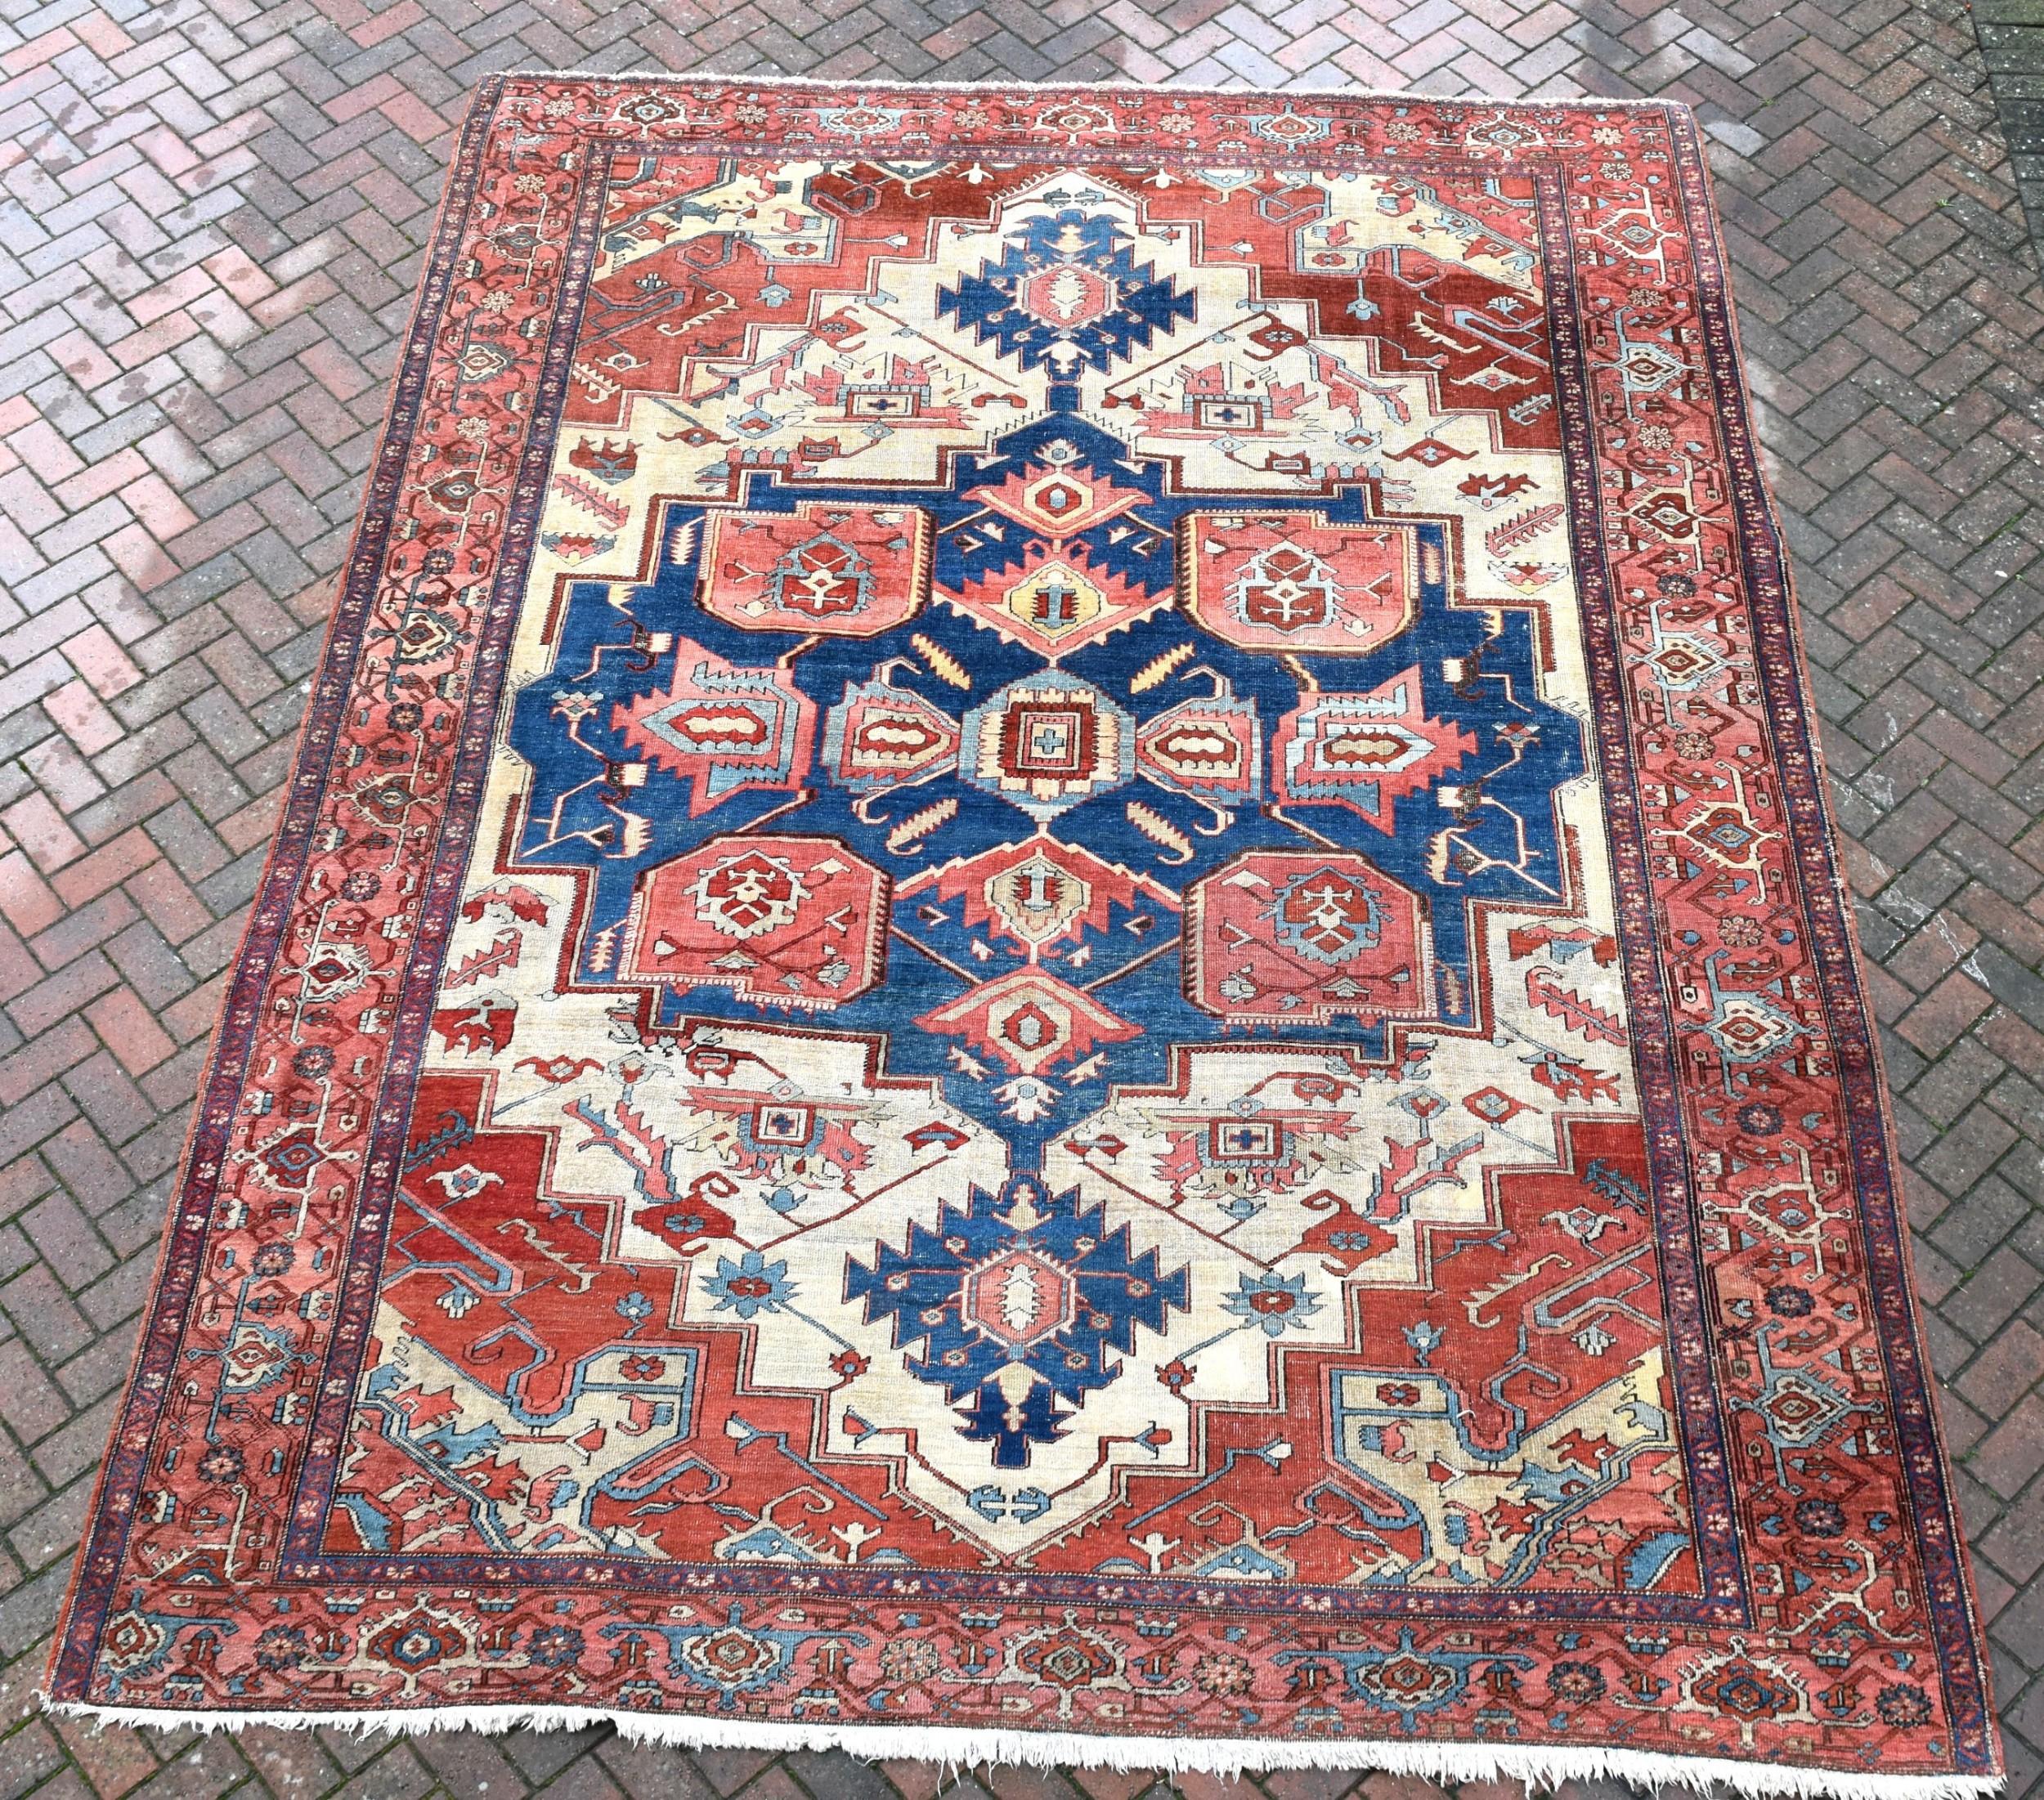 fine antique serapi carpet 388x297 cm